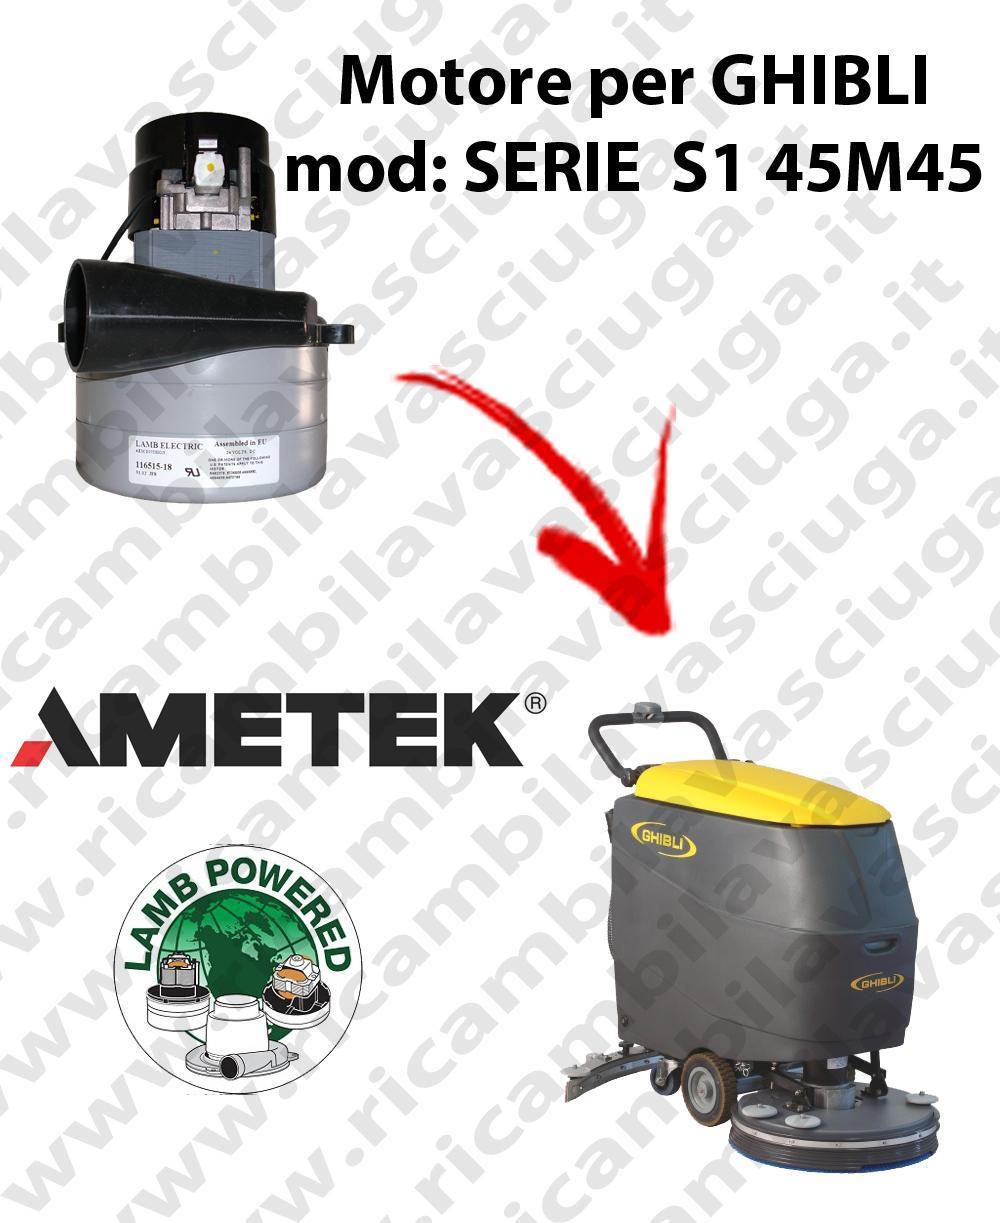 SERIE S1 45M45 BC Motore de aspiración LAMB AMETEK para fregadora GHIBLI